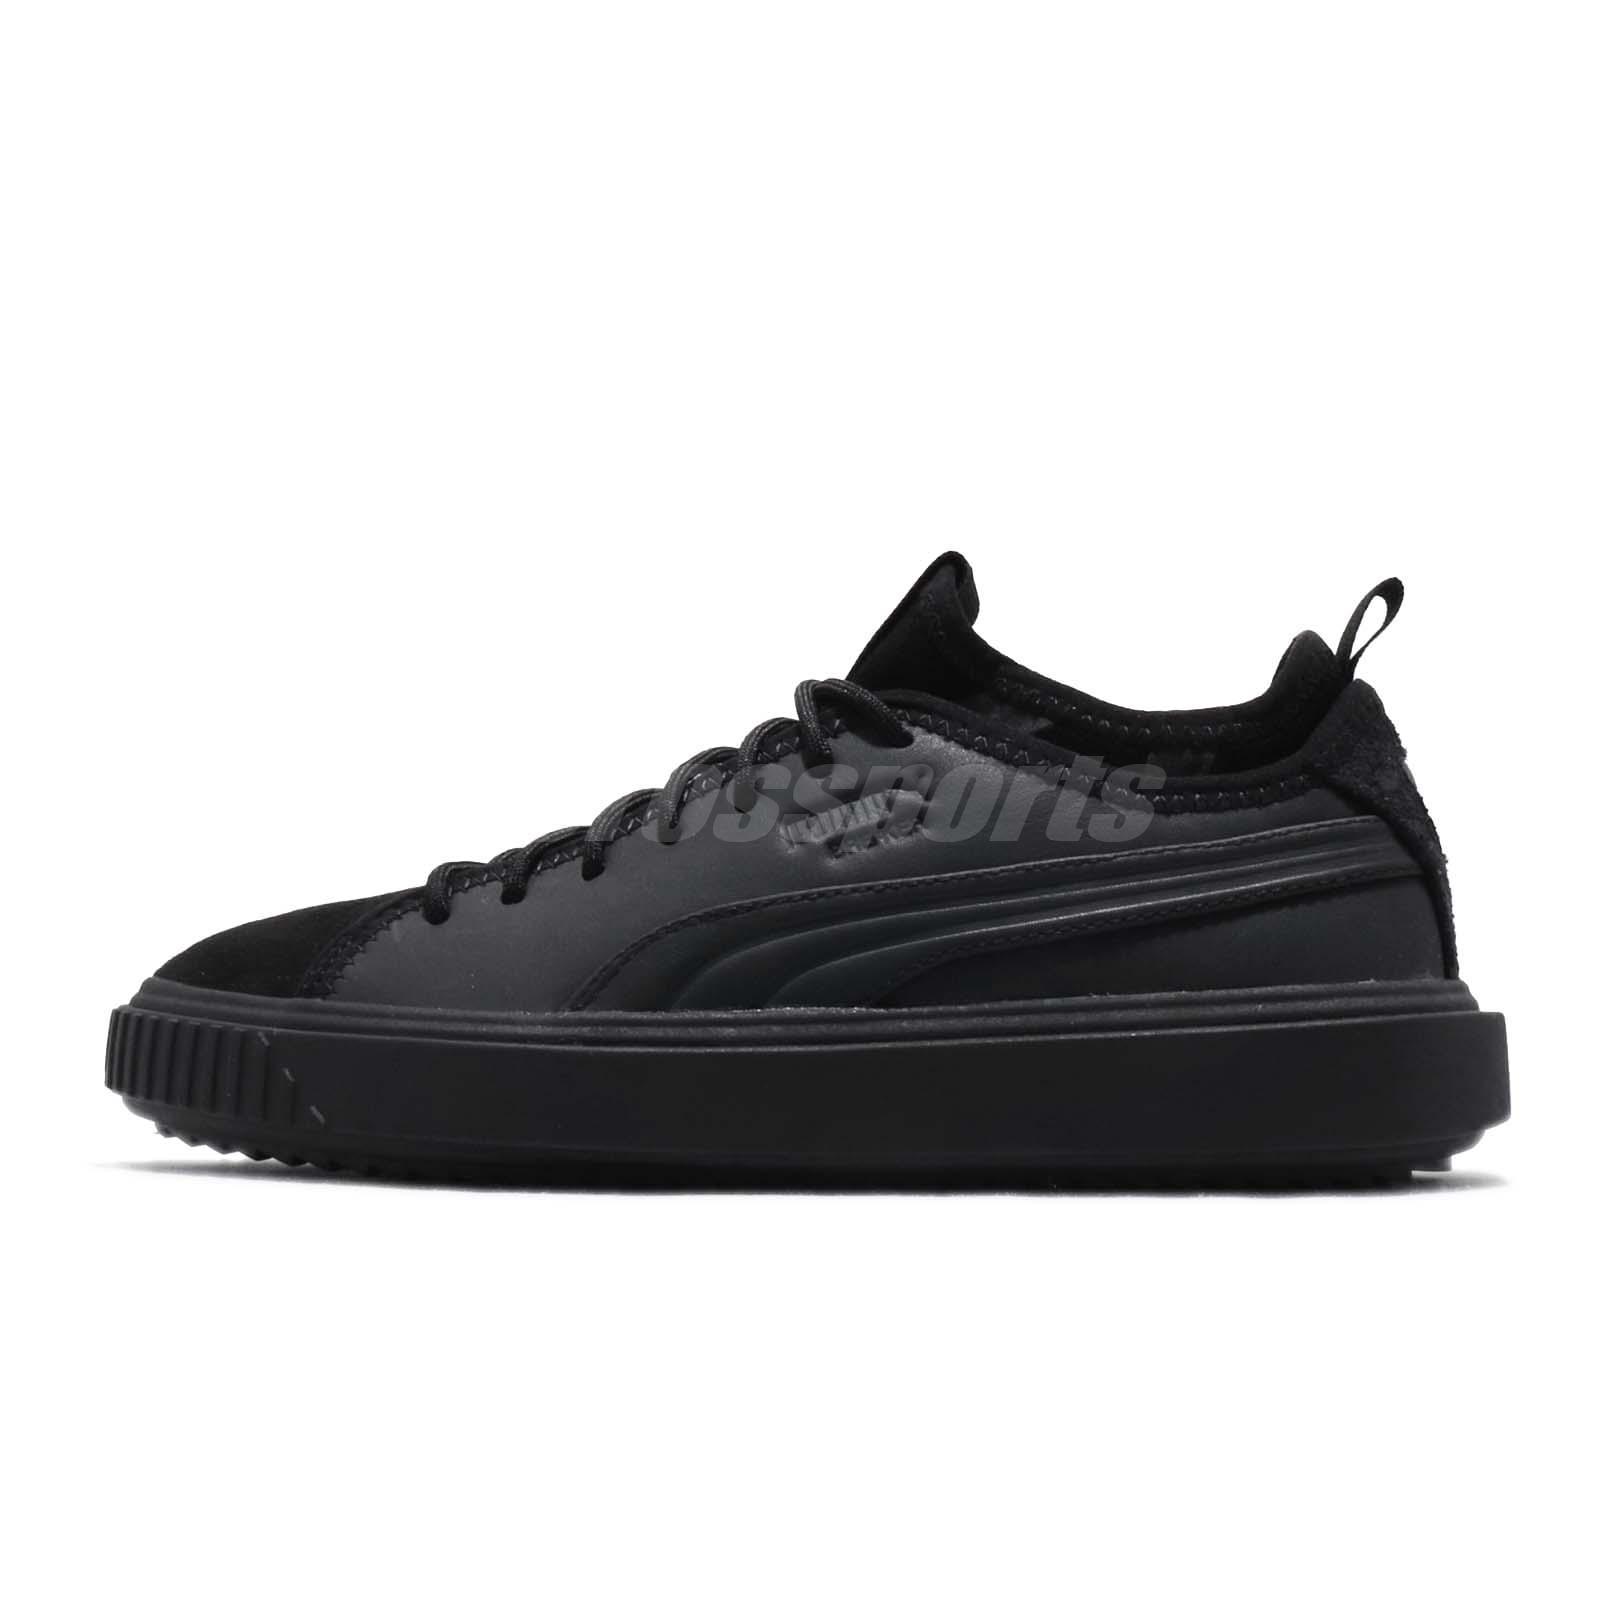 fa2bb34c916a40 Puma Breaker Mesh PA Black Grey Men Women Casual Shoes Sneakers 366988-01